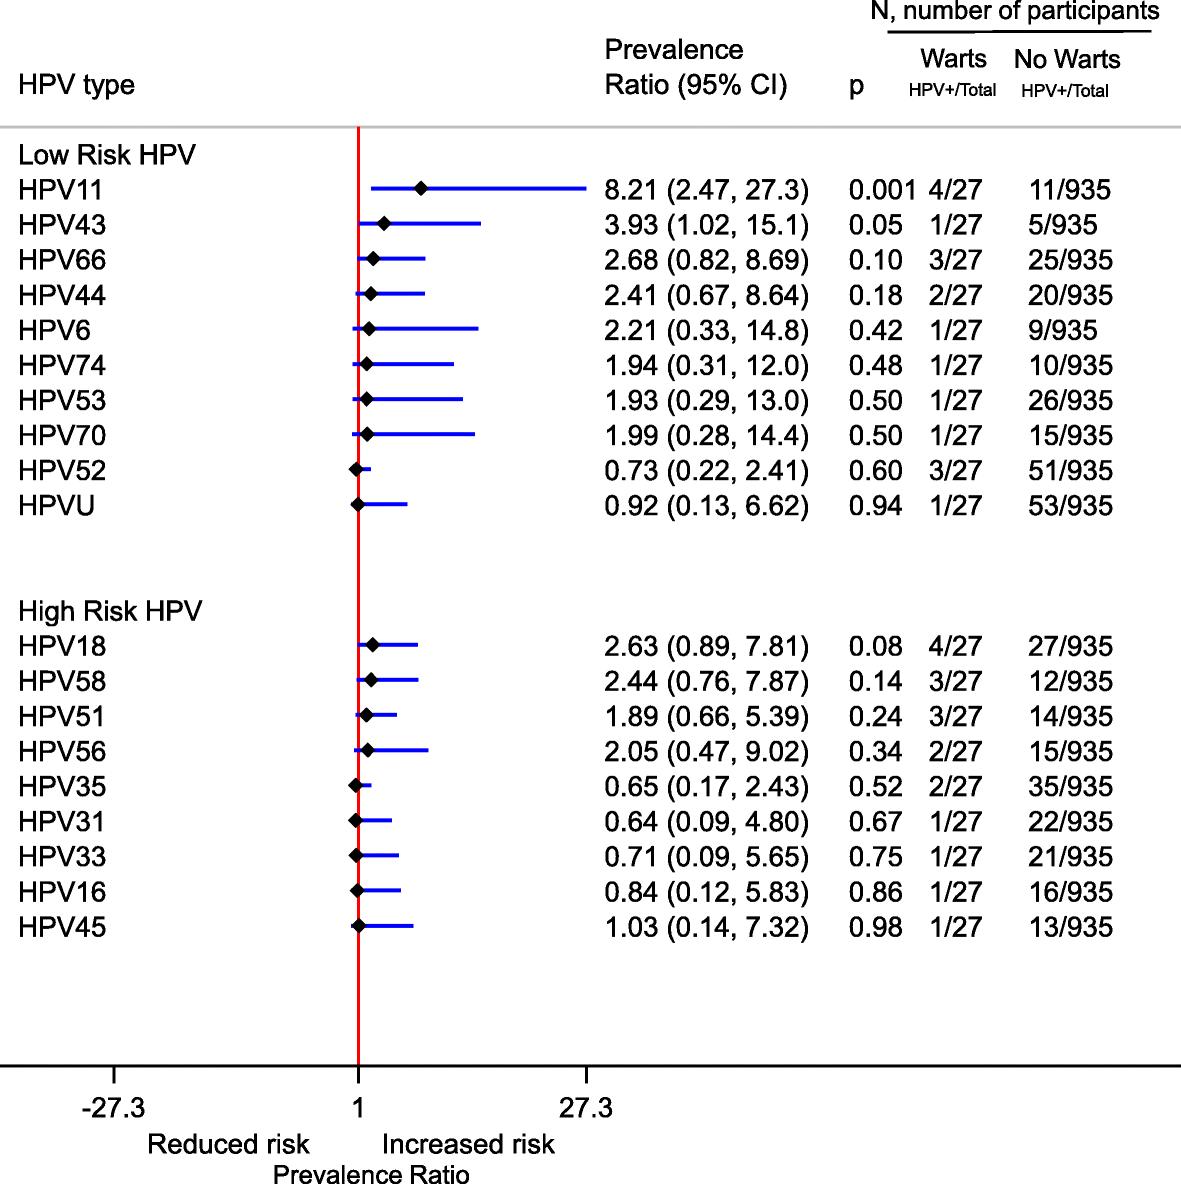 hpv high risk ratio strevni paraziti u kocek